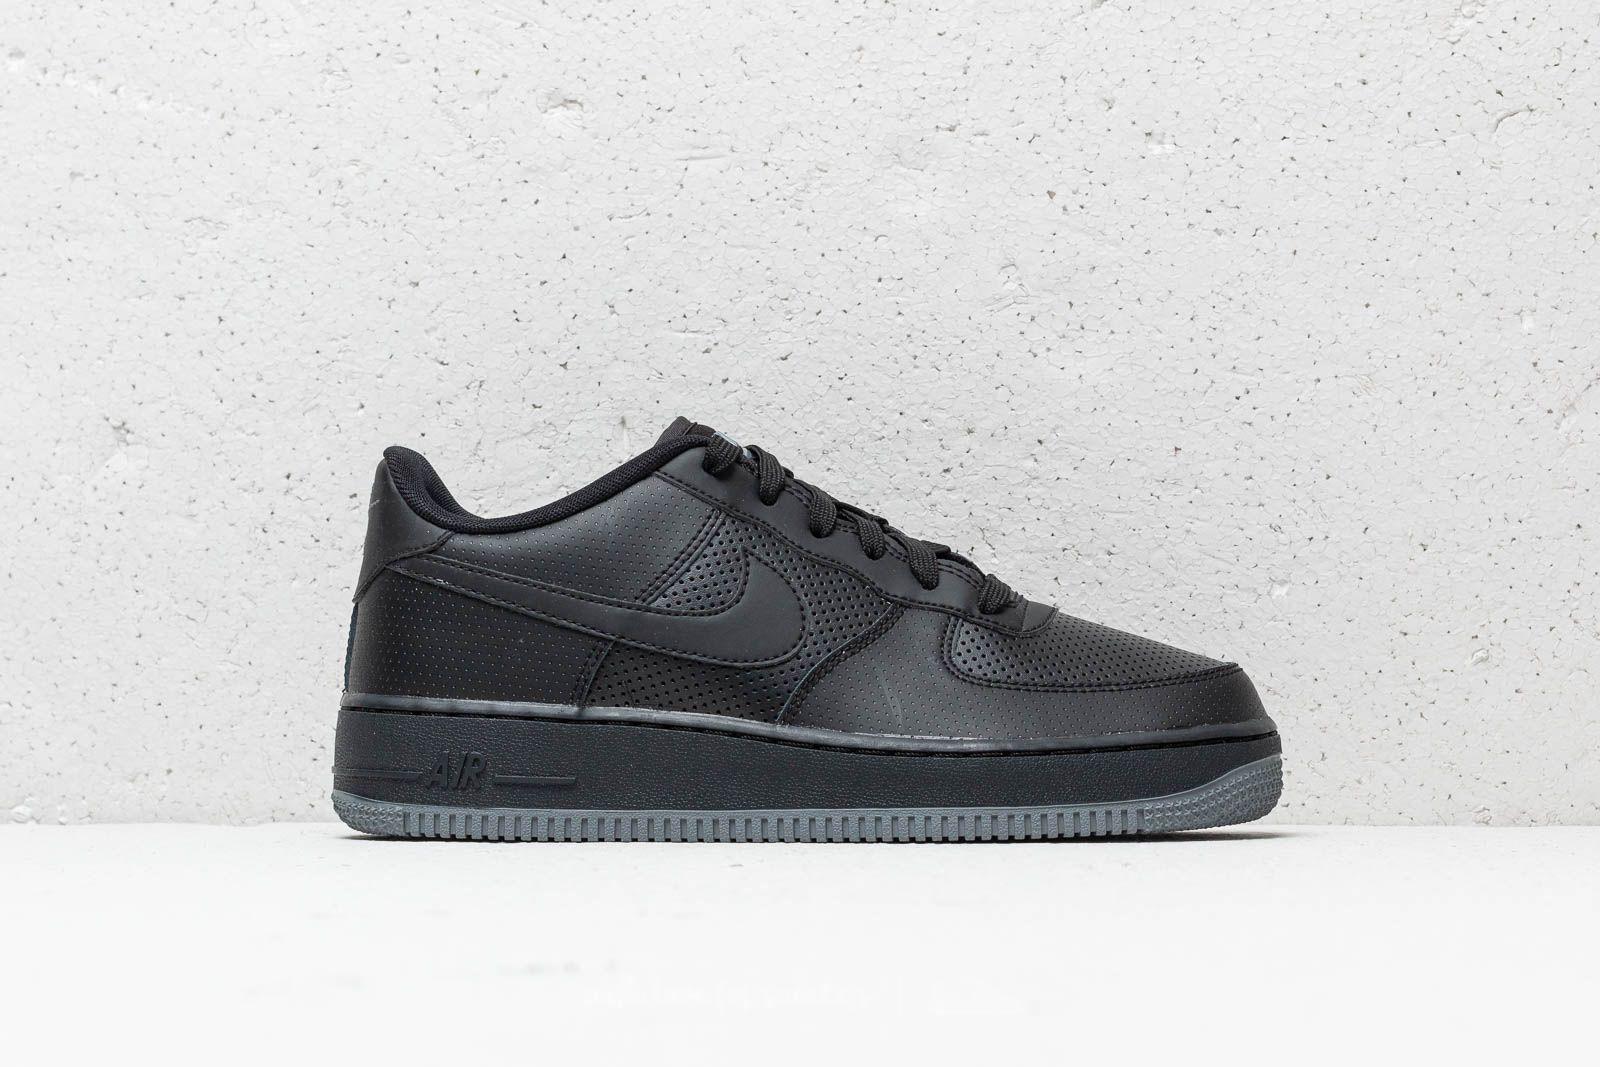 innovative design ea6cd e0d30 Nike Air Force 1 LV8 Perf (GS) Black  Black-Dark Grey at